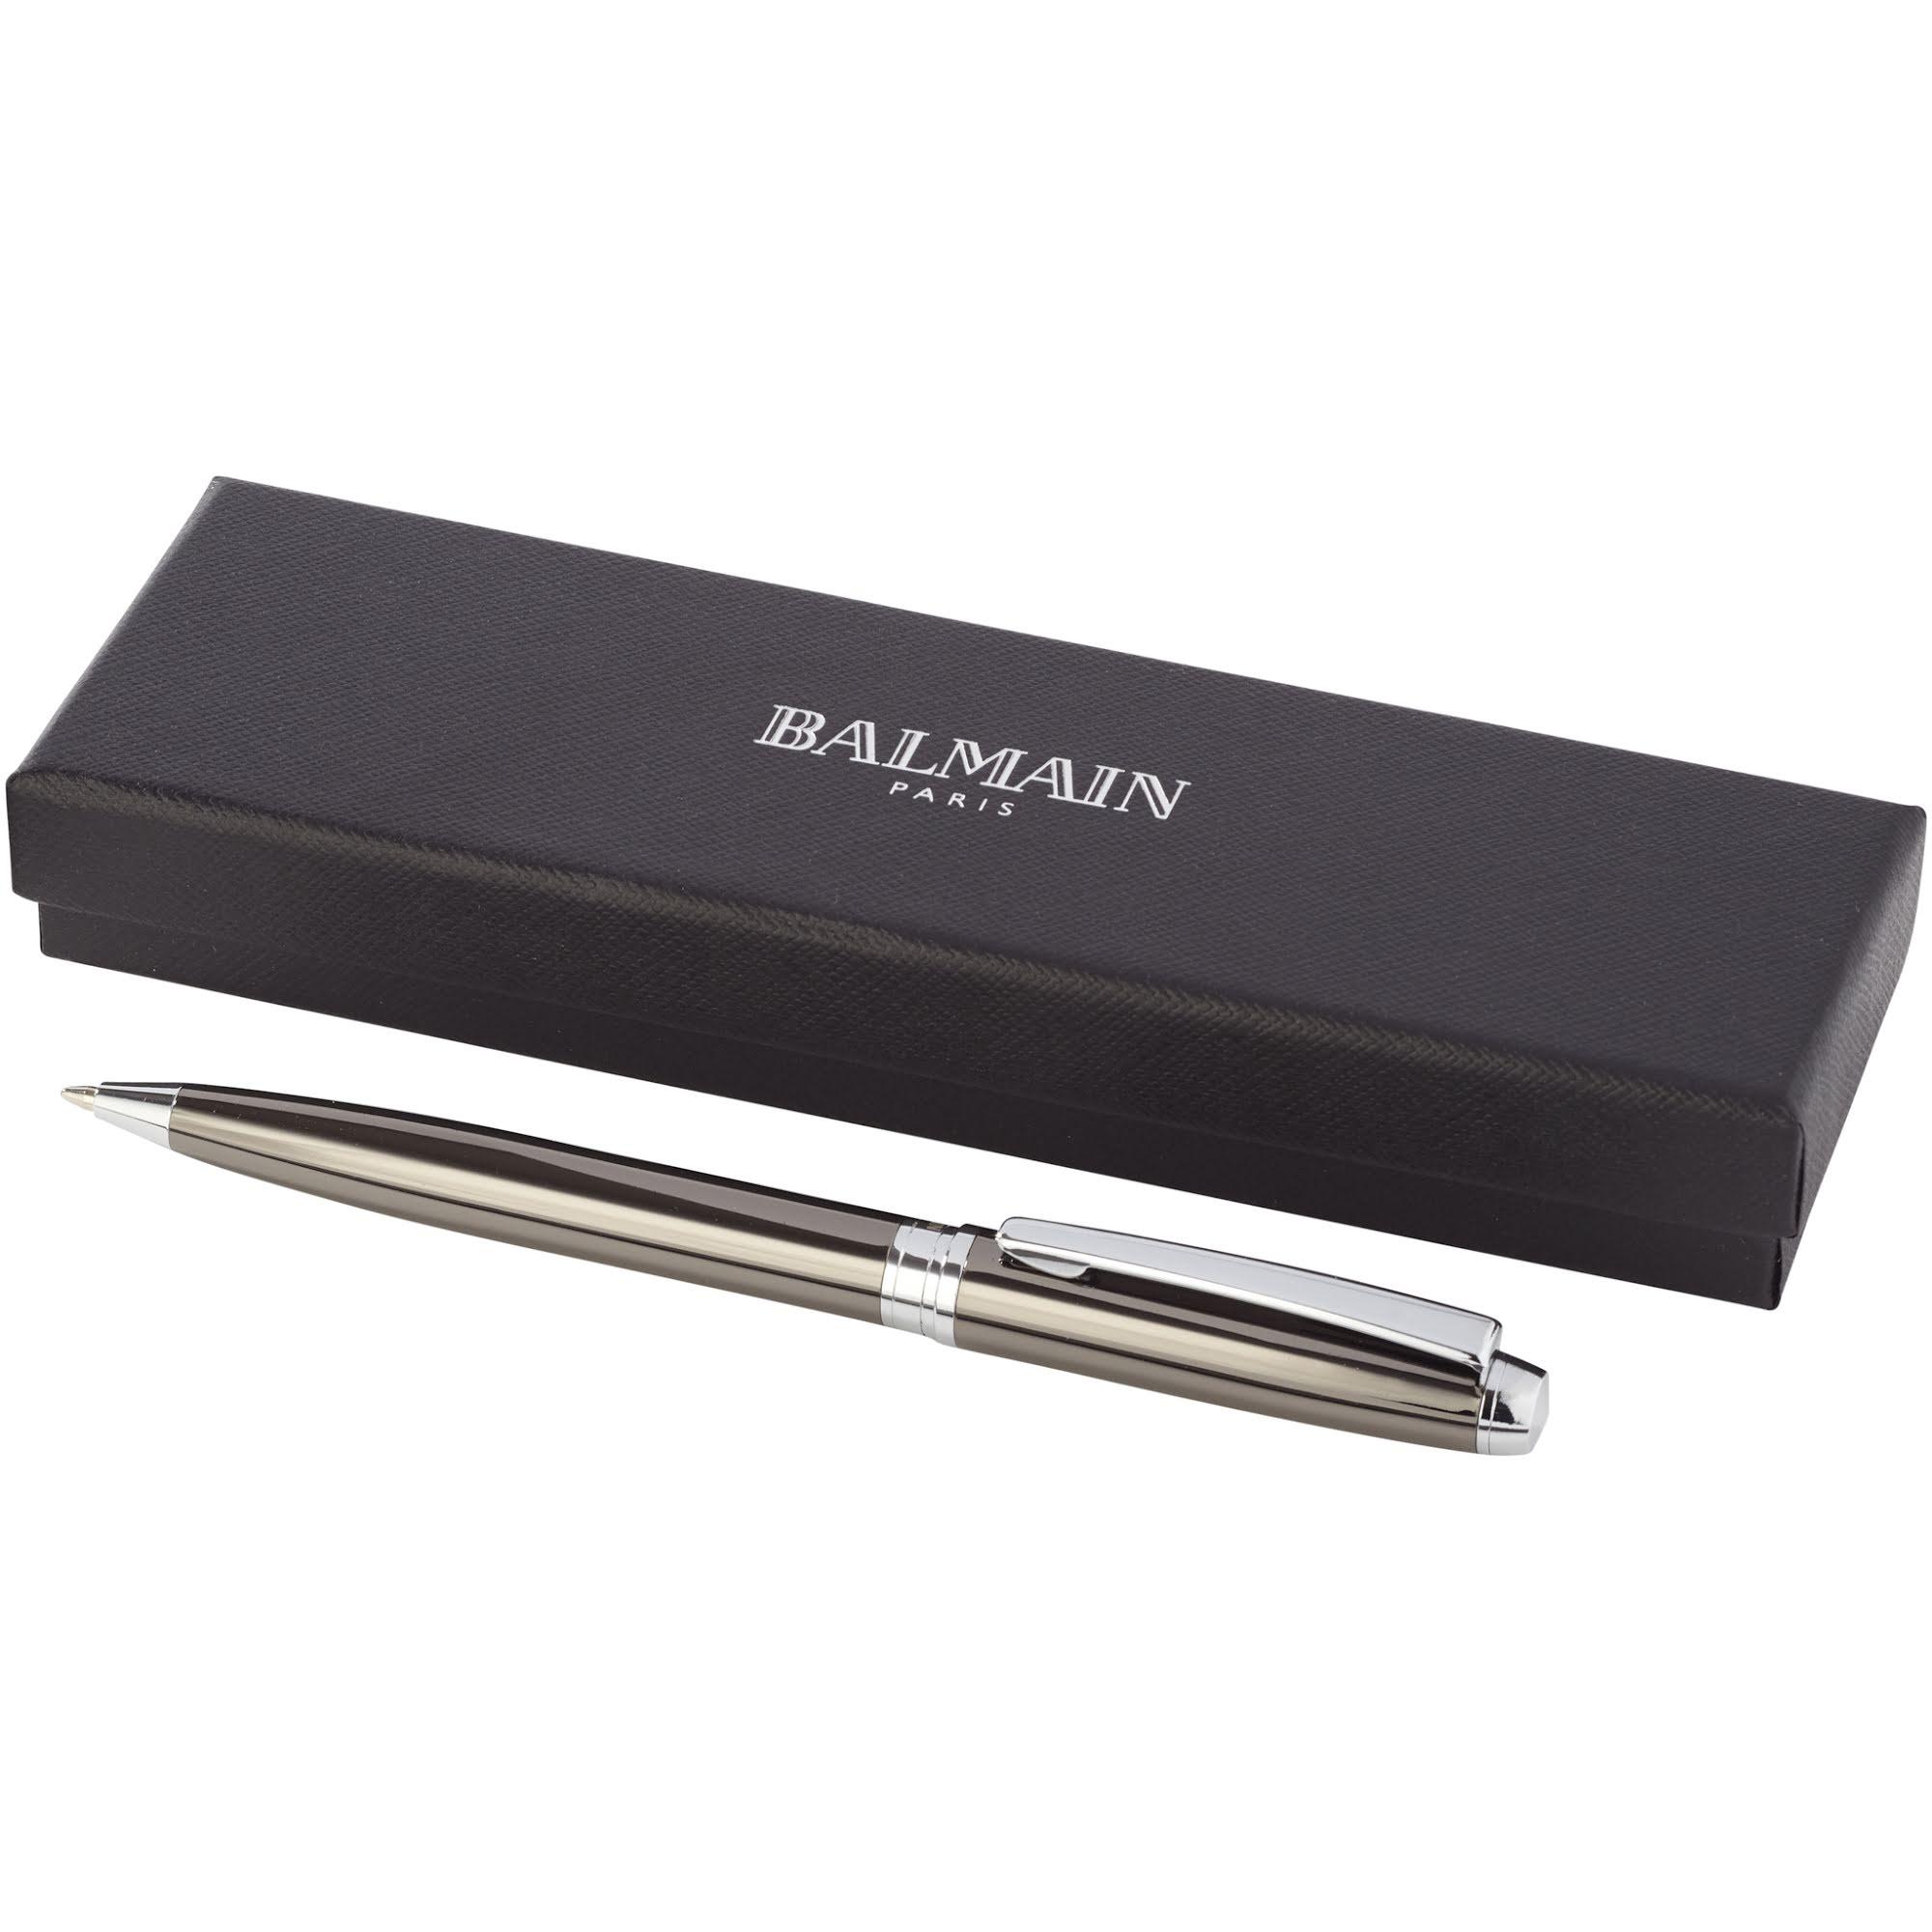 Balmain Aphelion Gunmetal Pen